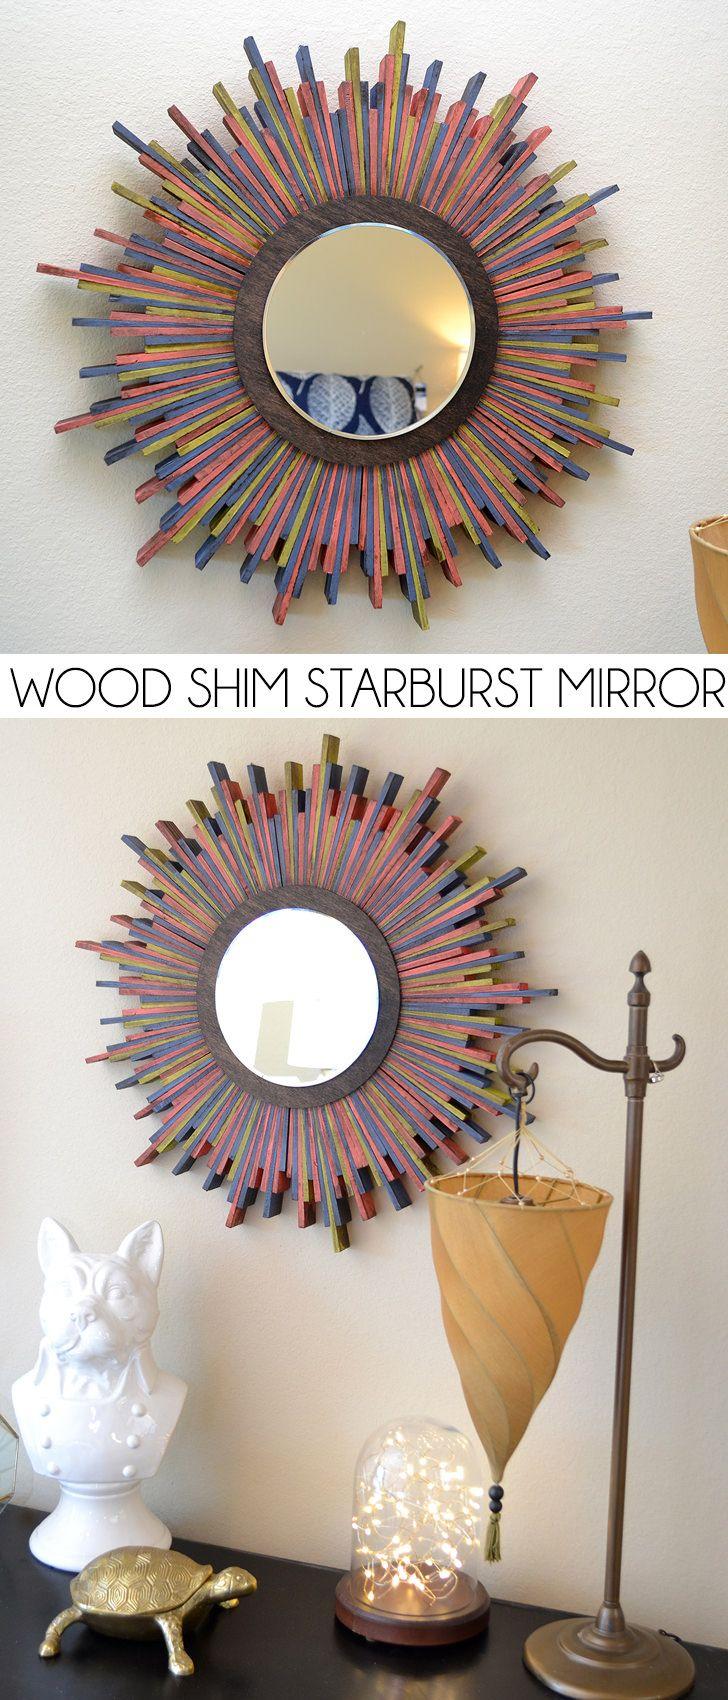 Diy Mirror Projects 136 Best Espejos Con Detalles De Manualidades Images On Pinterest